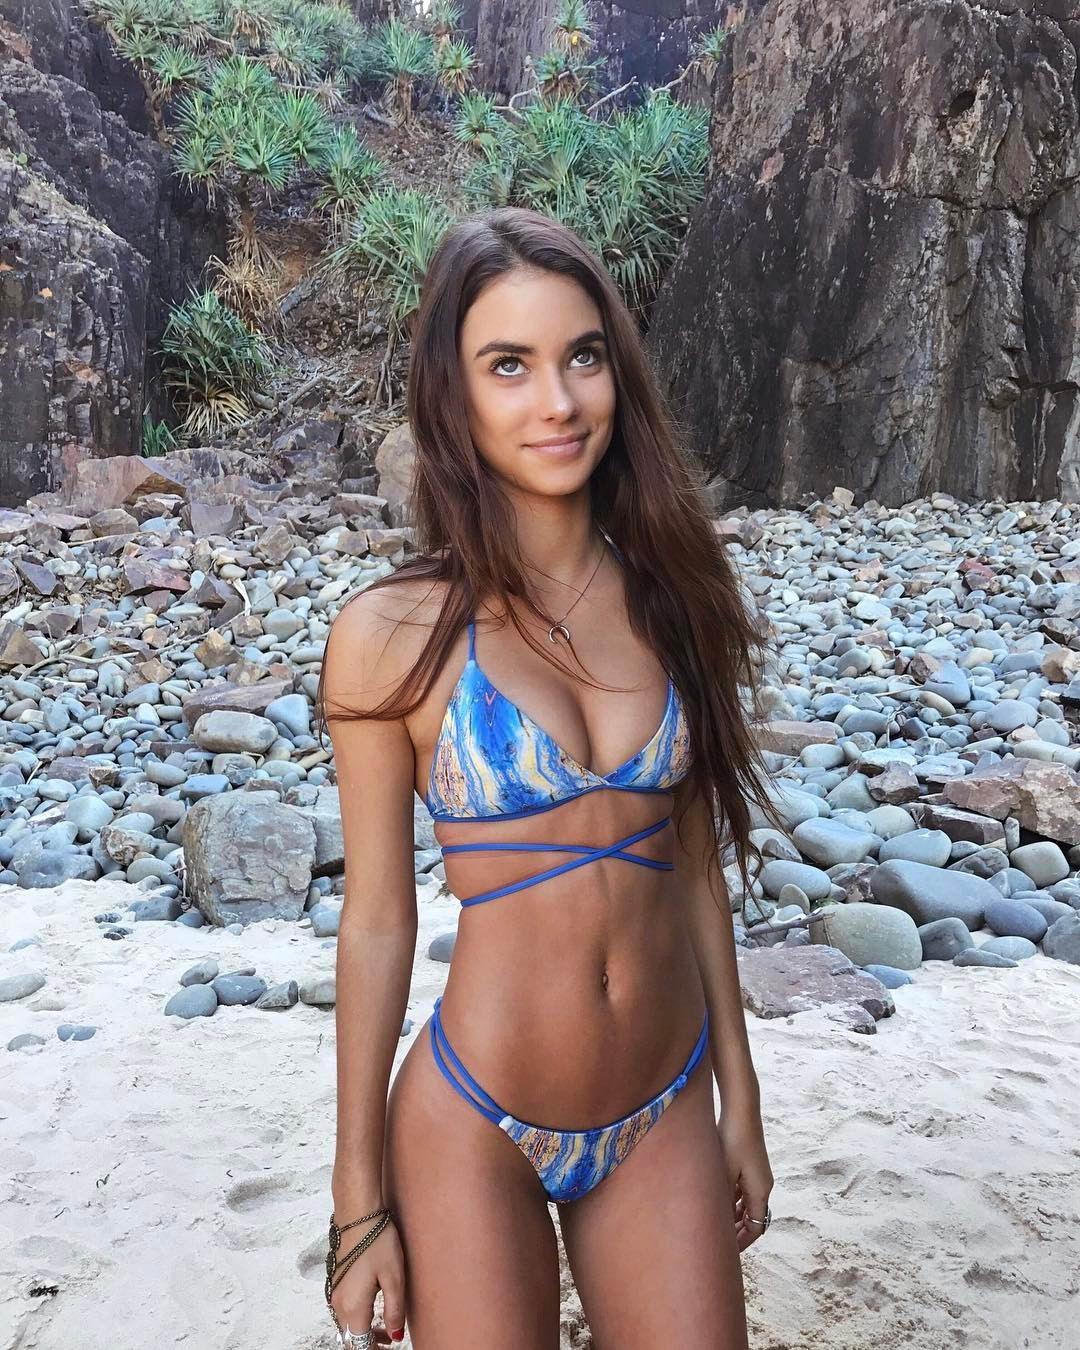 mujer-en-bikini